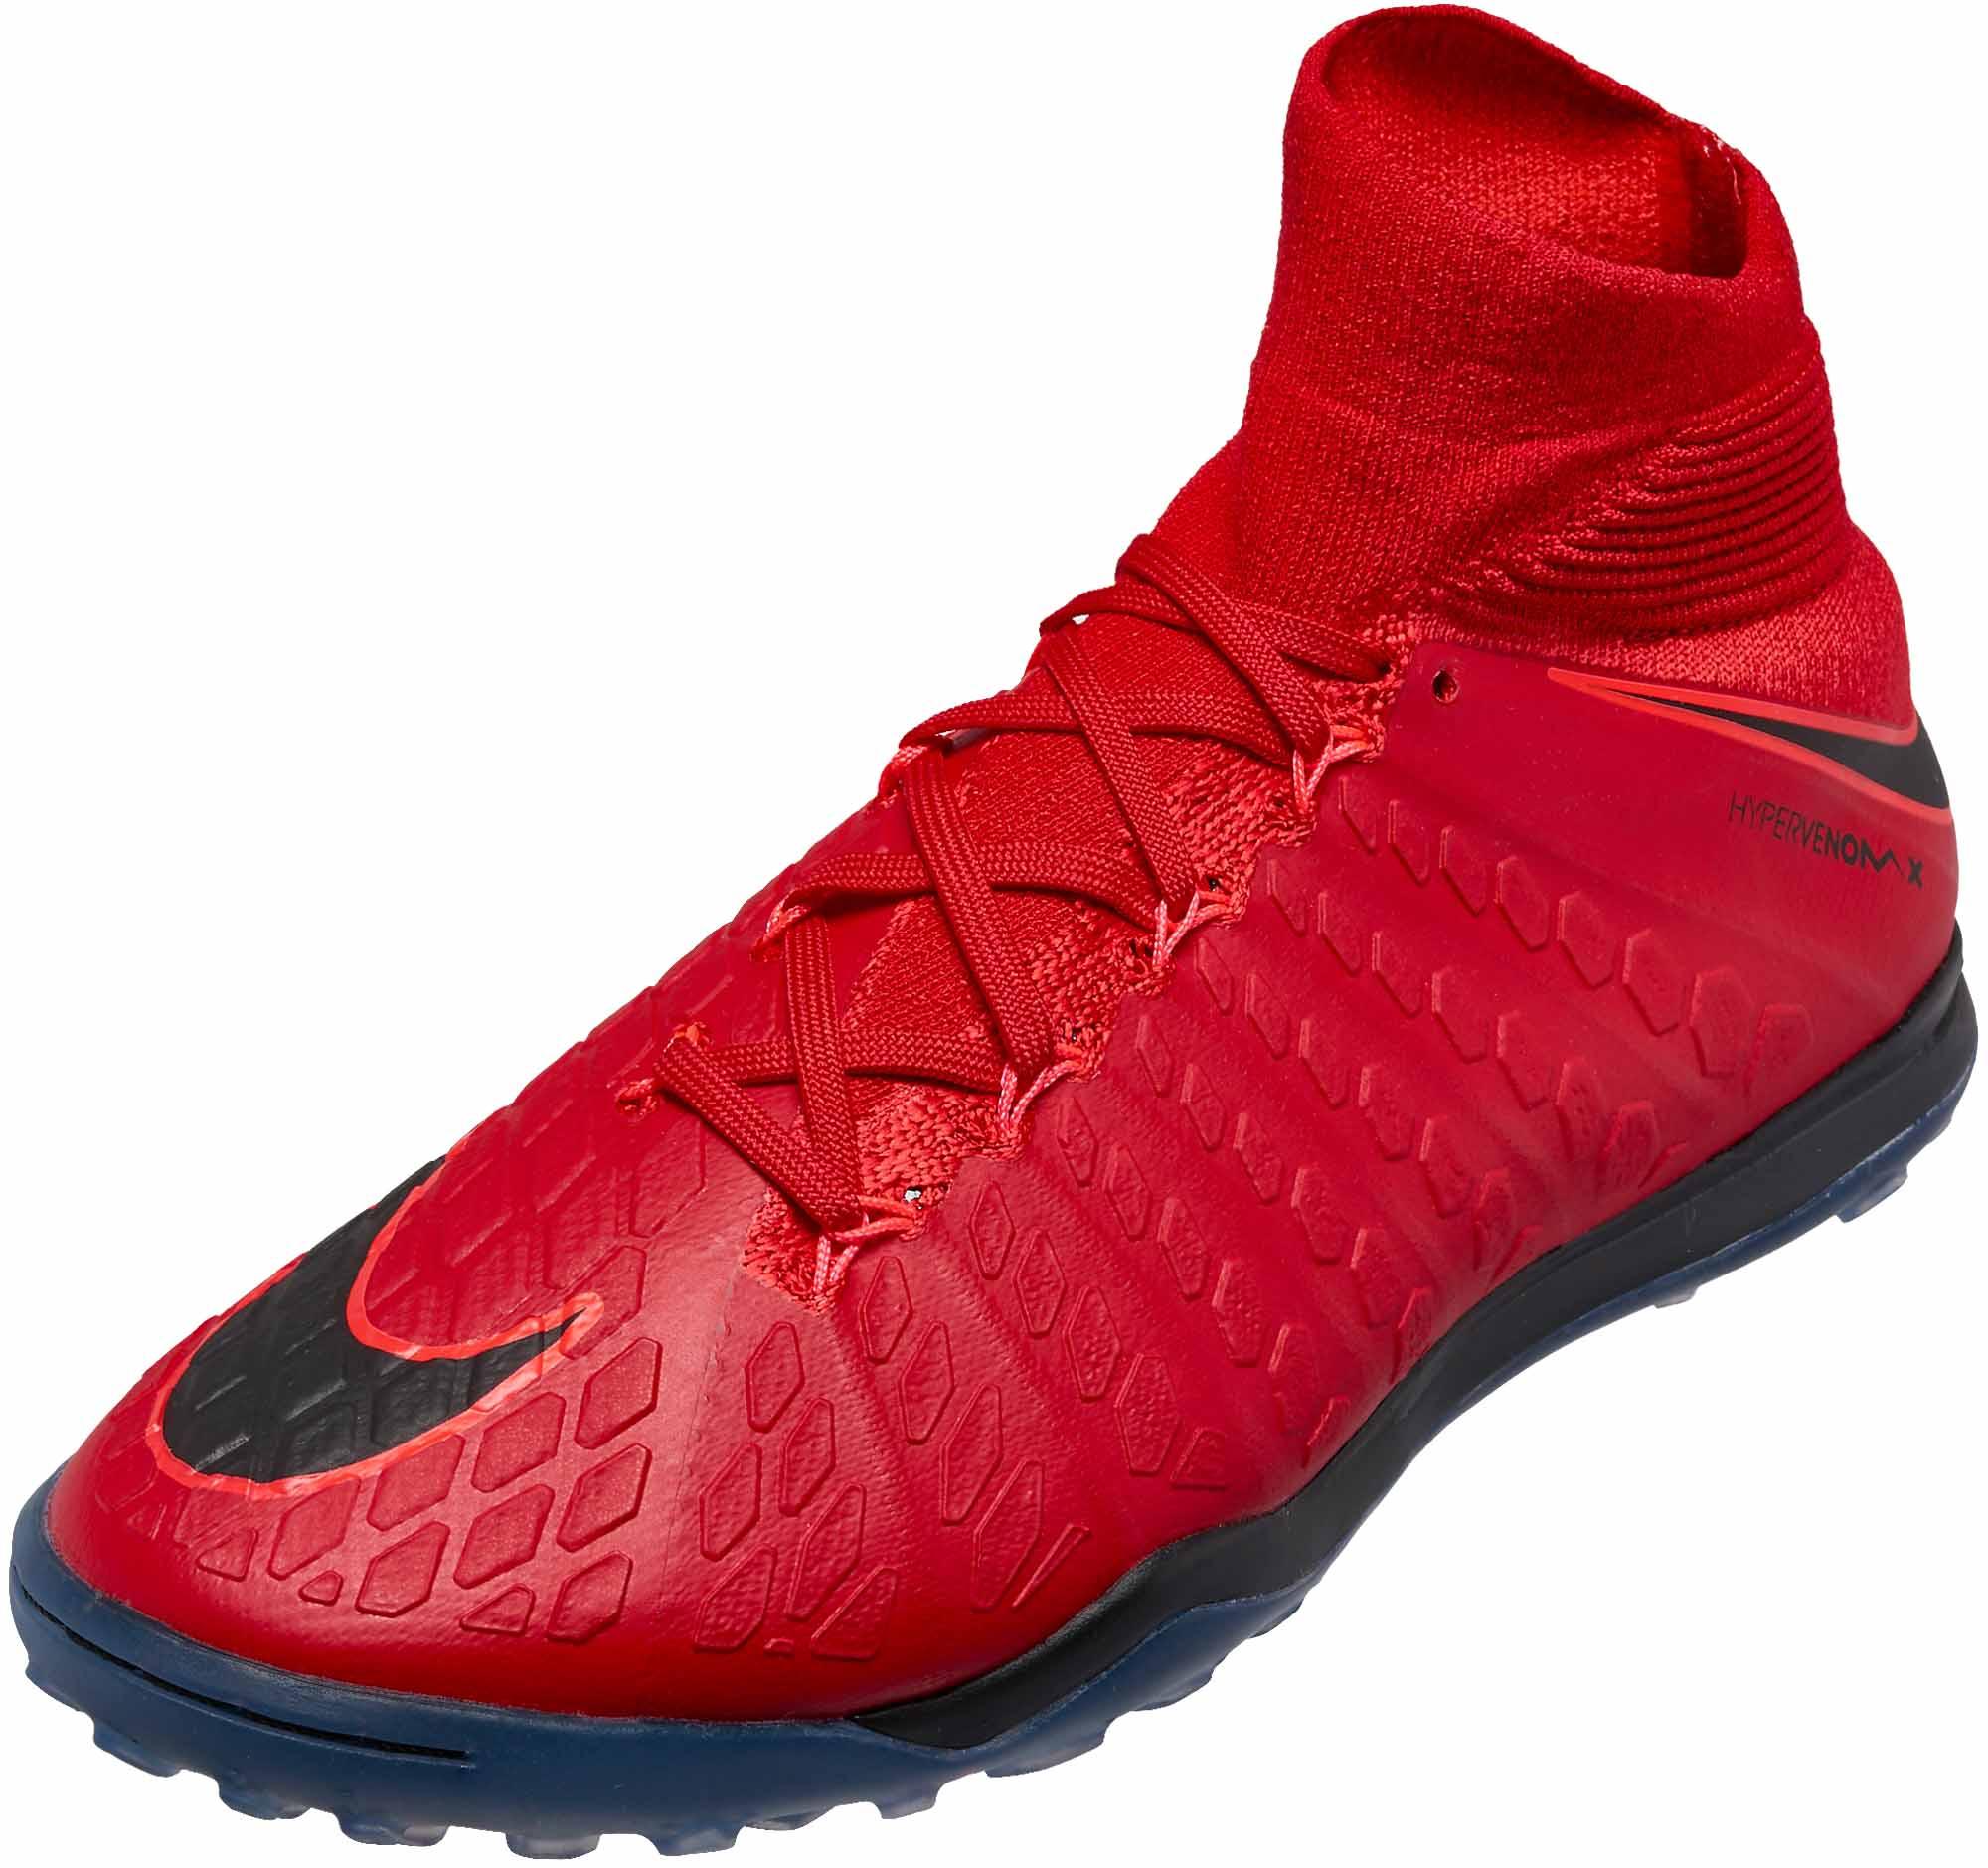 Nike HypervenomX Proximo II DF TF Nike HypervenomX Proximo II DF TF - University Red